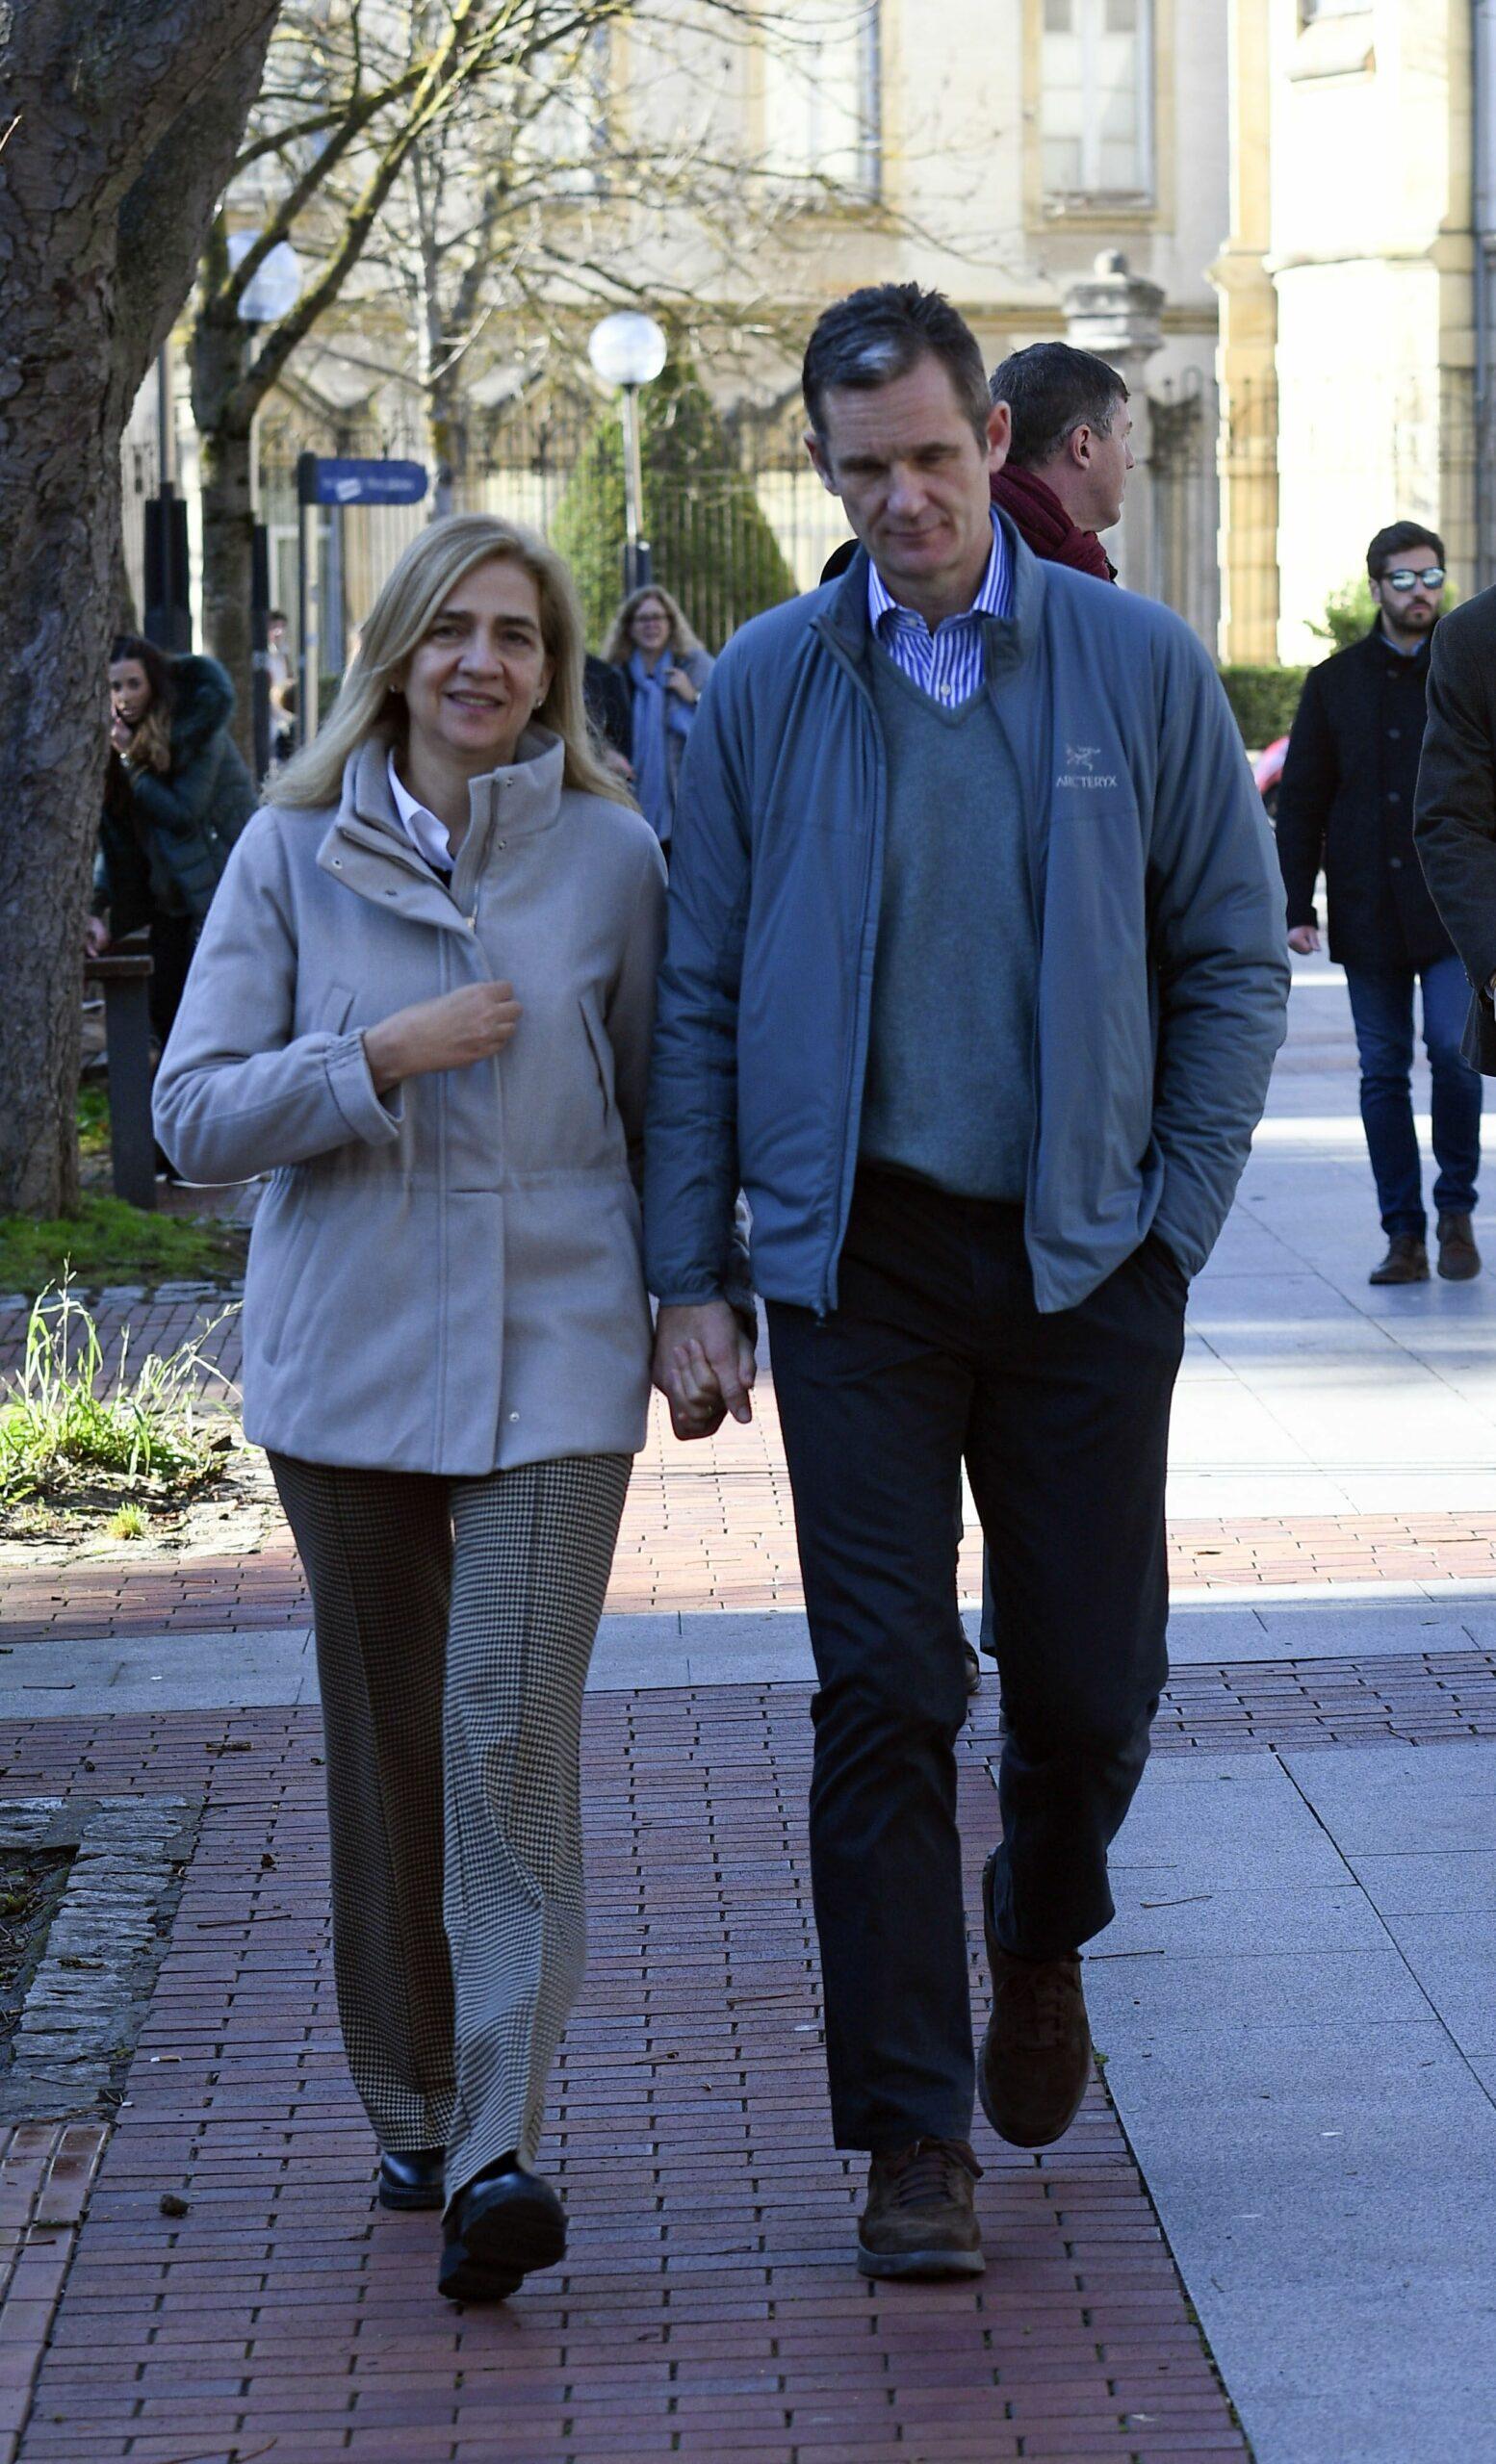 La infanta Cristina i Iñaki Urdagarin passen el Nadal a Vitòria  Europa Press